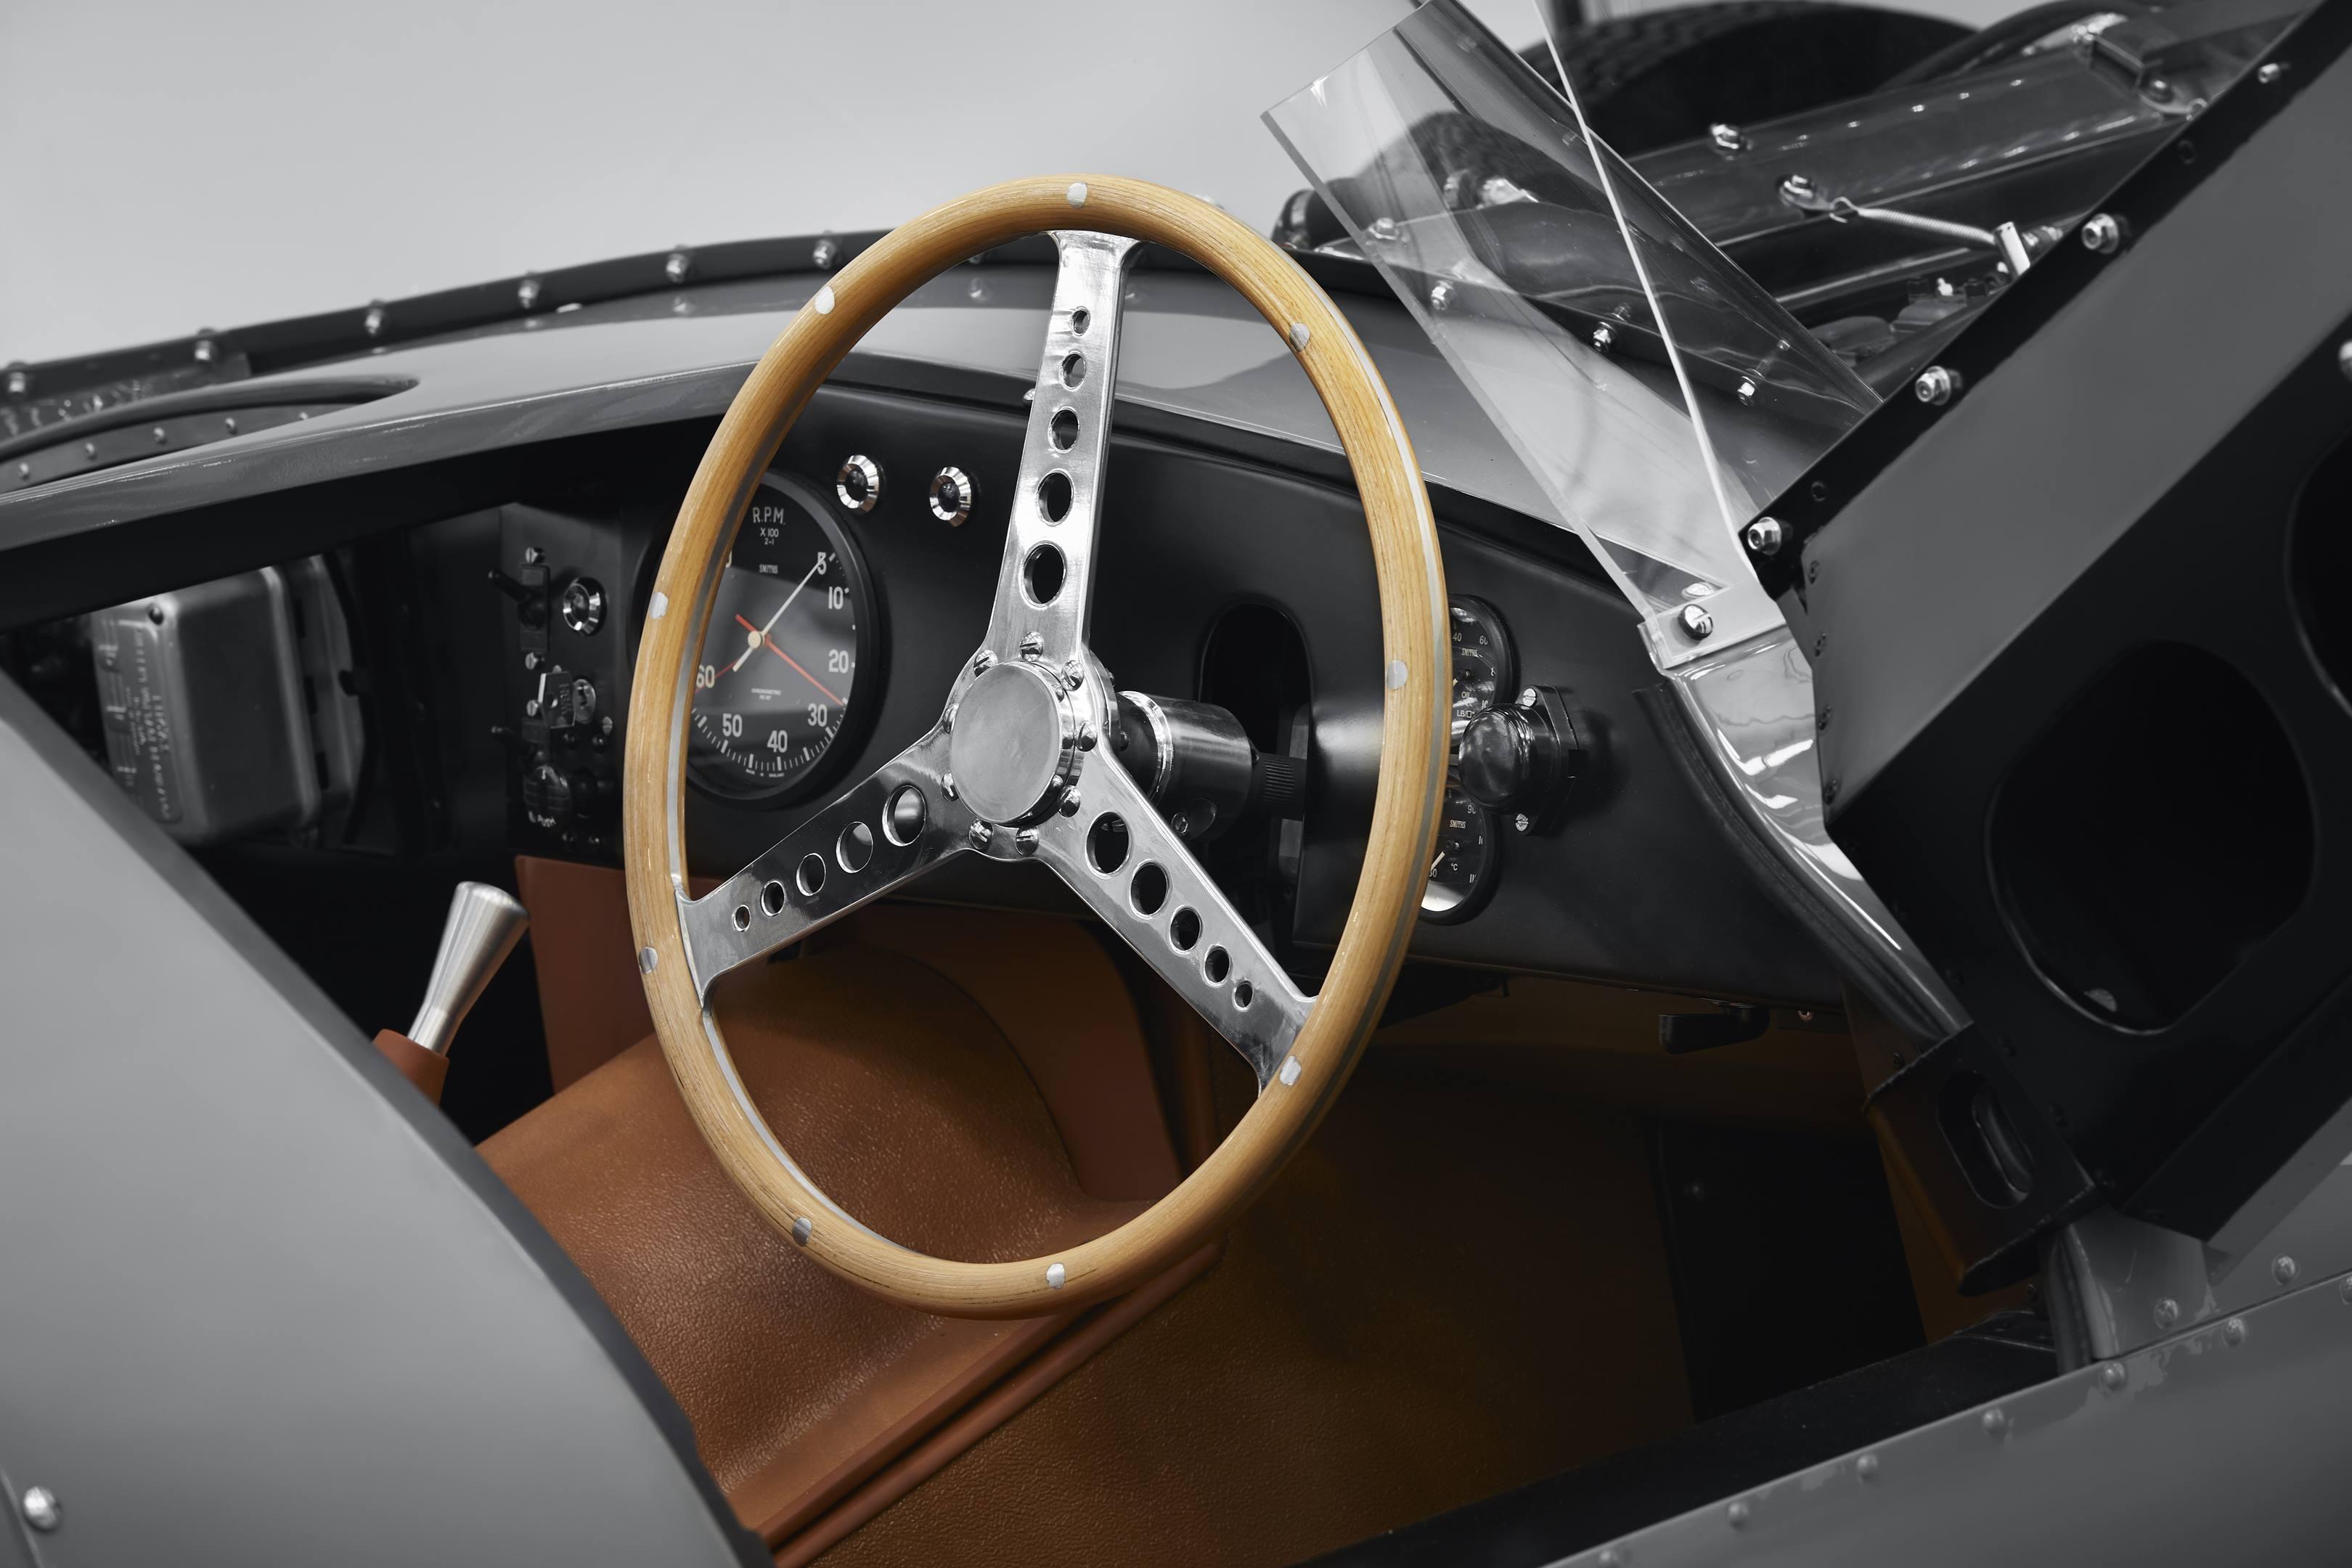 Jaguar D-type steering wheel